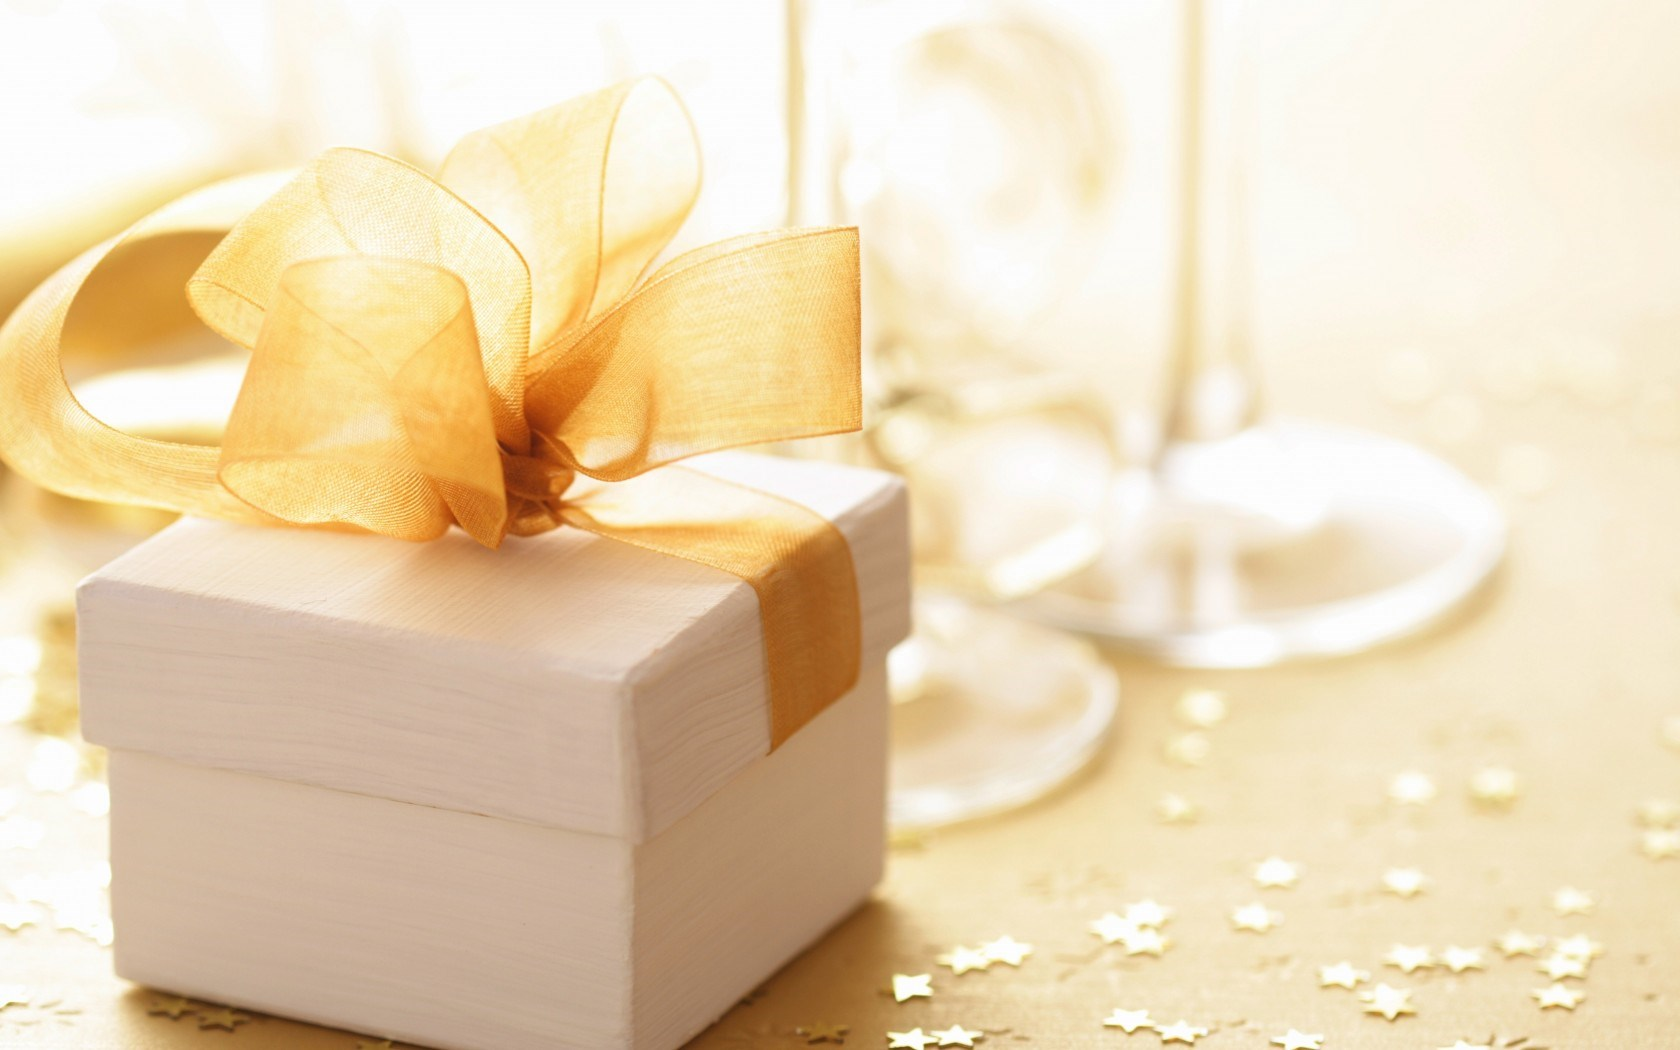 Gift Box Stars Gold Champagne Glasses New Year